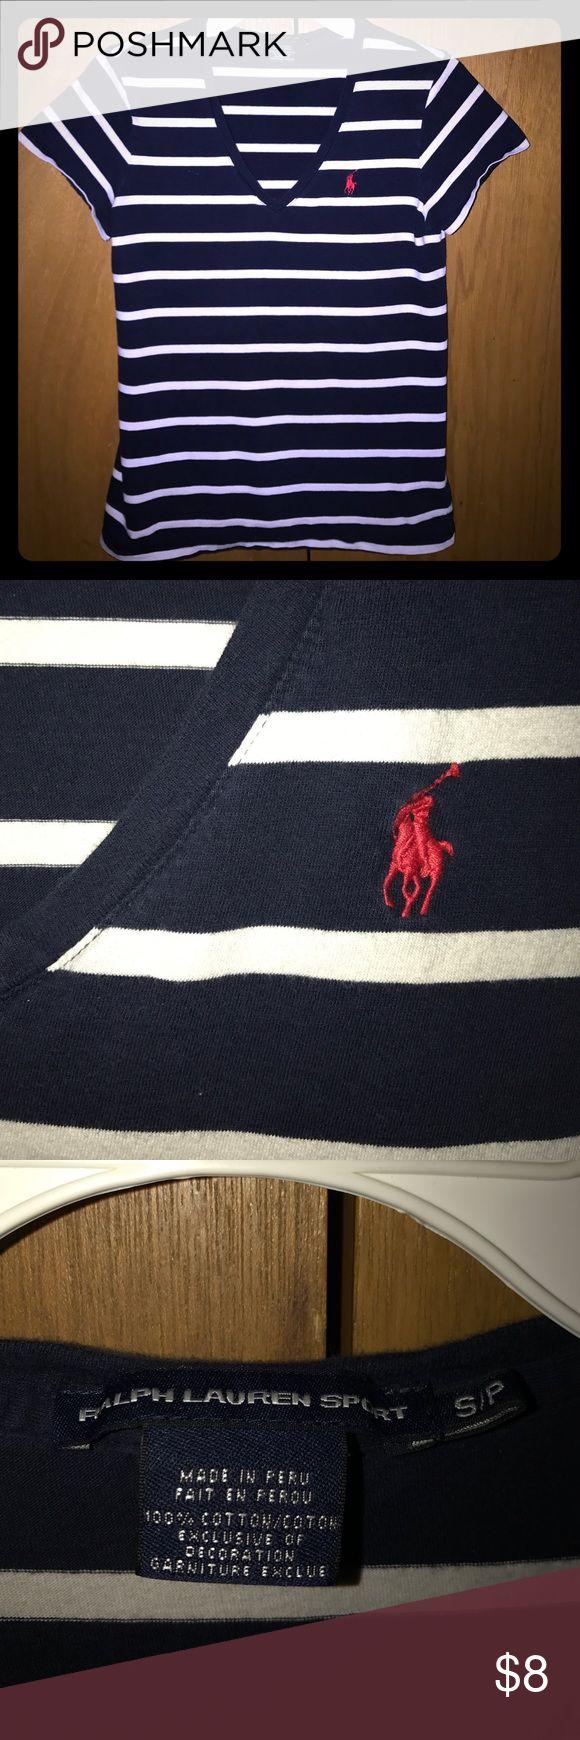 Blue and White Women's Polo Sport V-neck T-shirt Women's small blue and white striped Polo Ralph Lauren Sport v-neck t-shirt Polo by Ralph Lauren Tops Tees - Short Sleeve